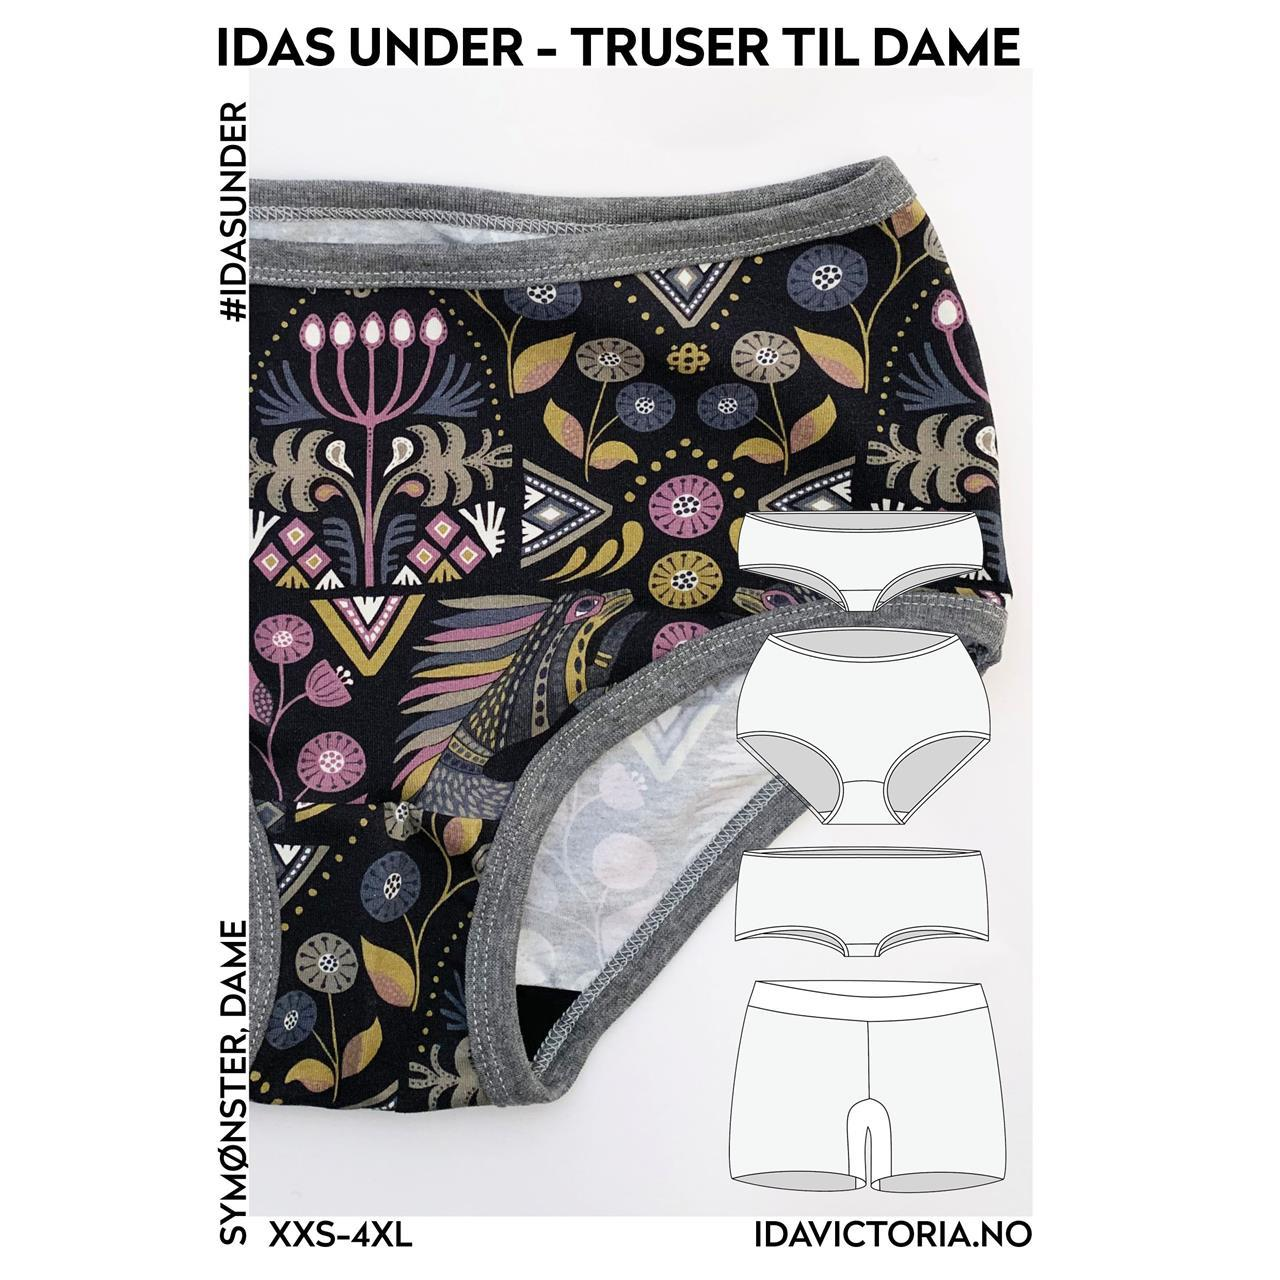 Idas under - truser til dame